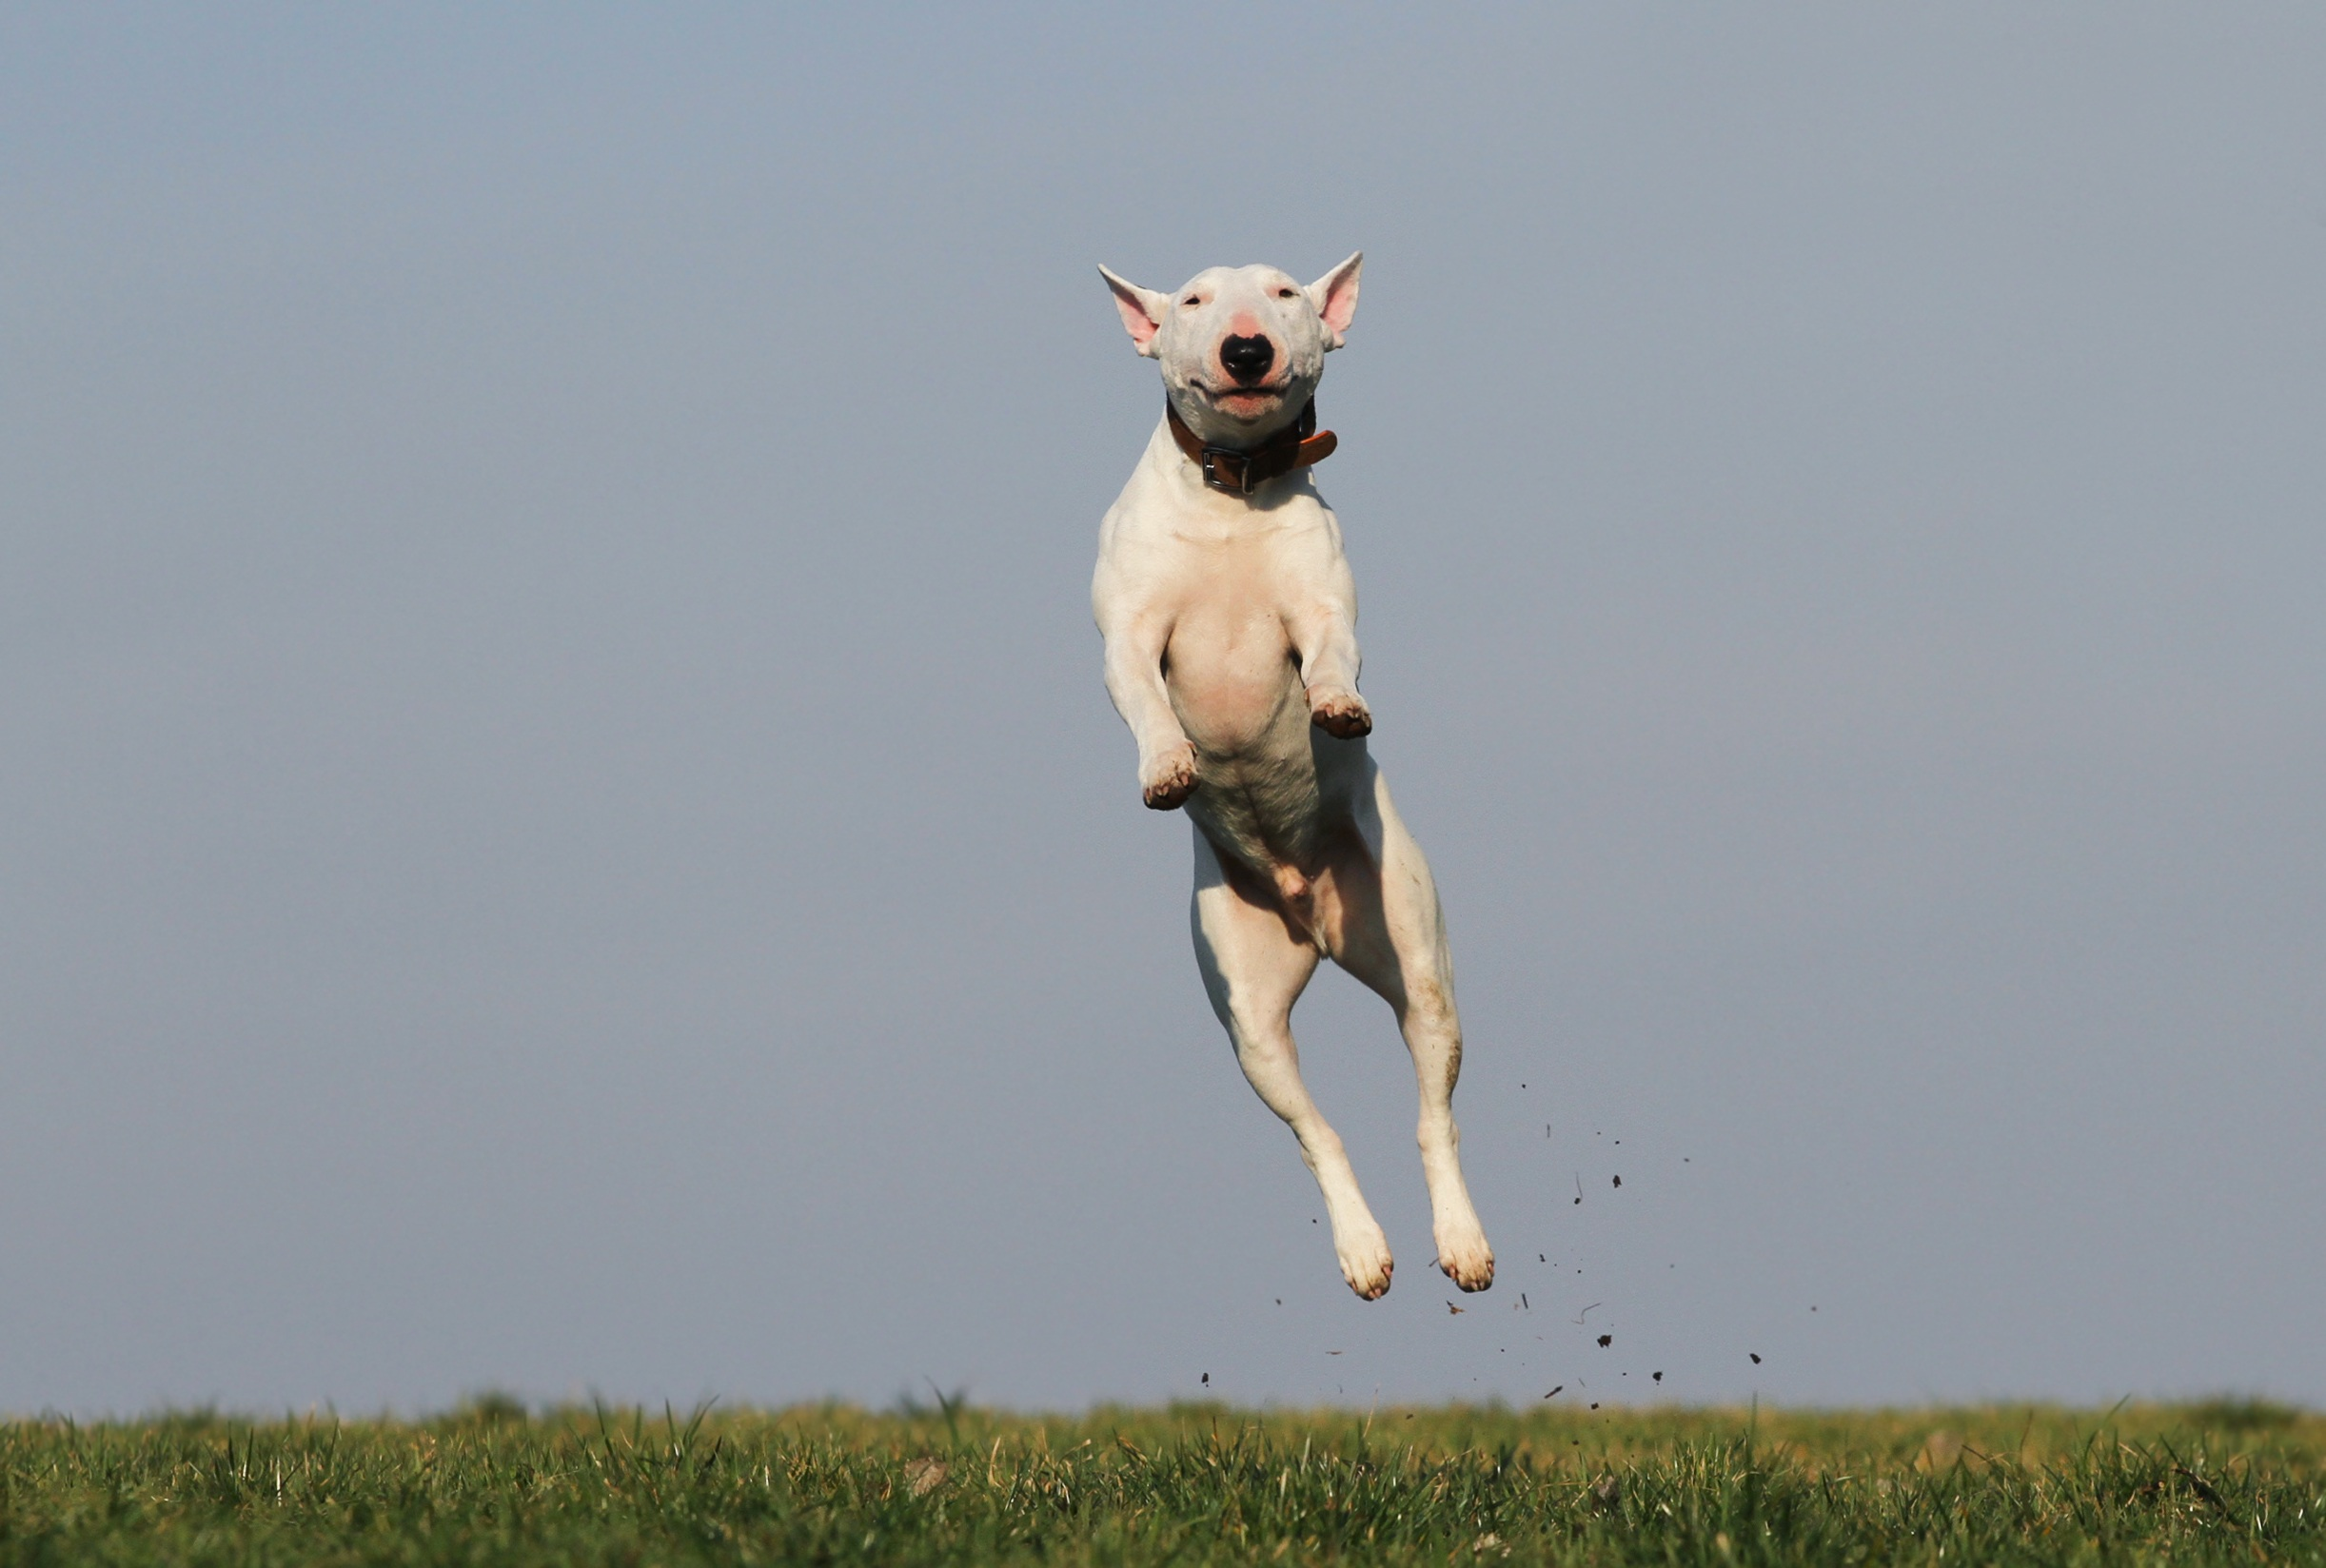 jack-russell-jumping.jpeg